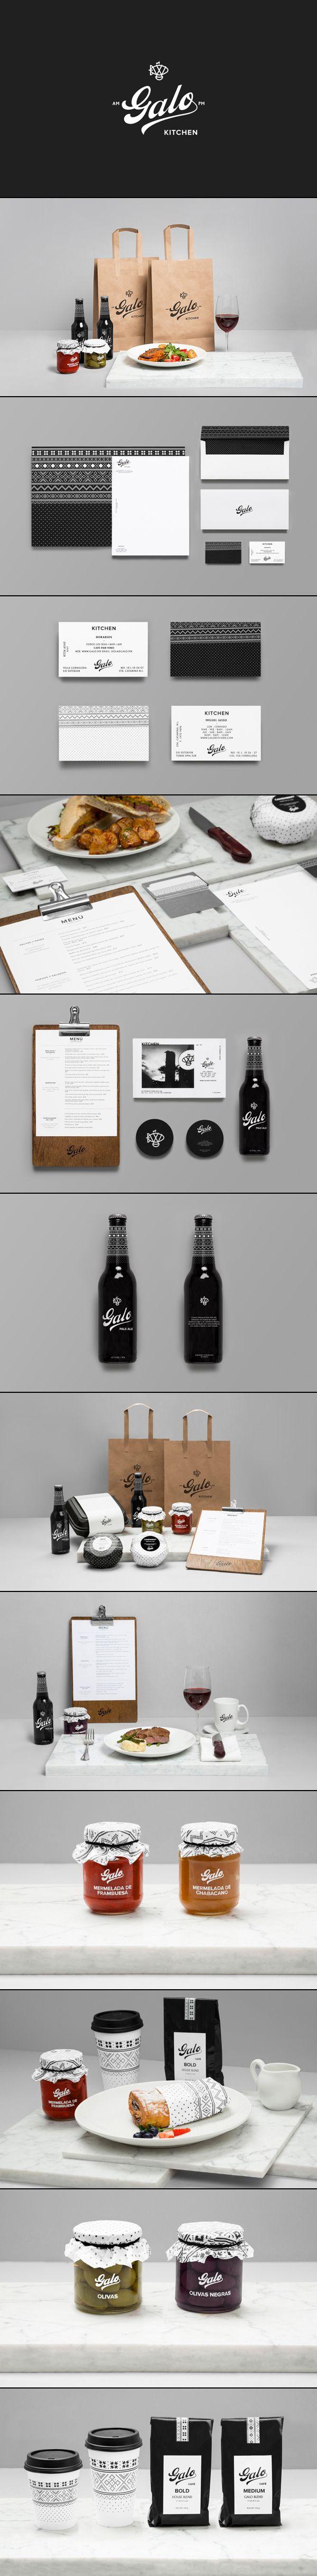 Galo Kitchen by Anagrama #branding #design